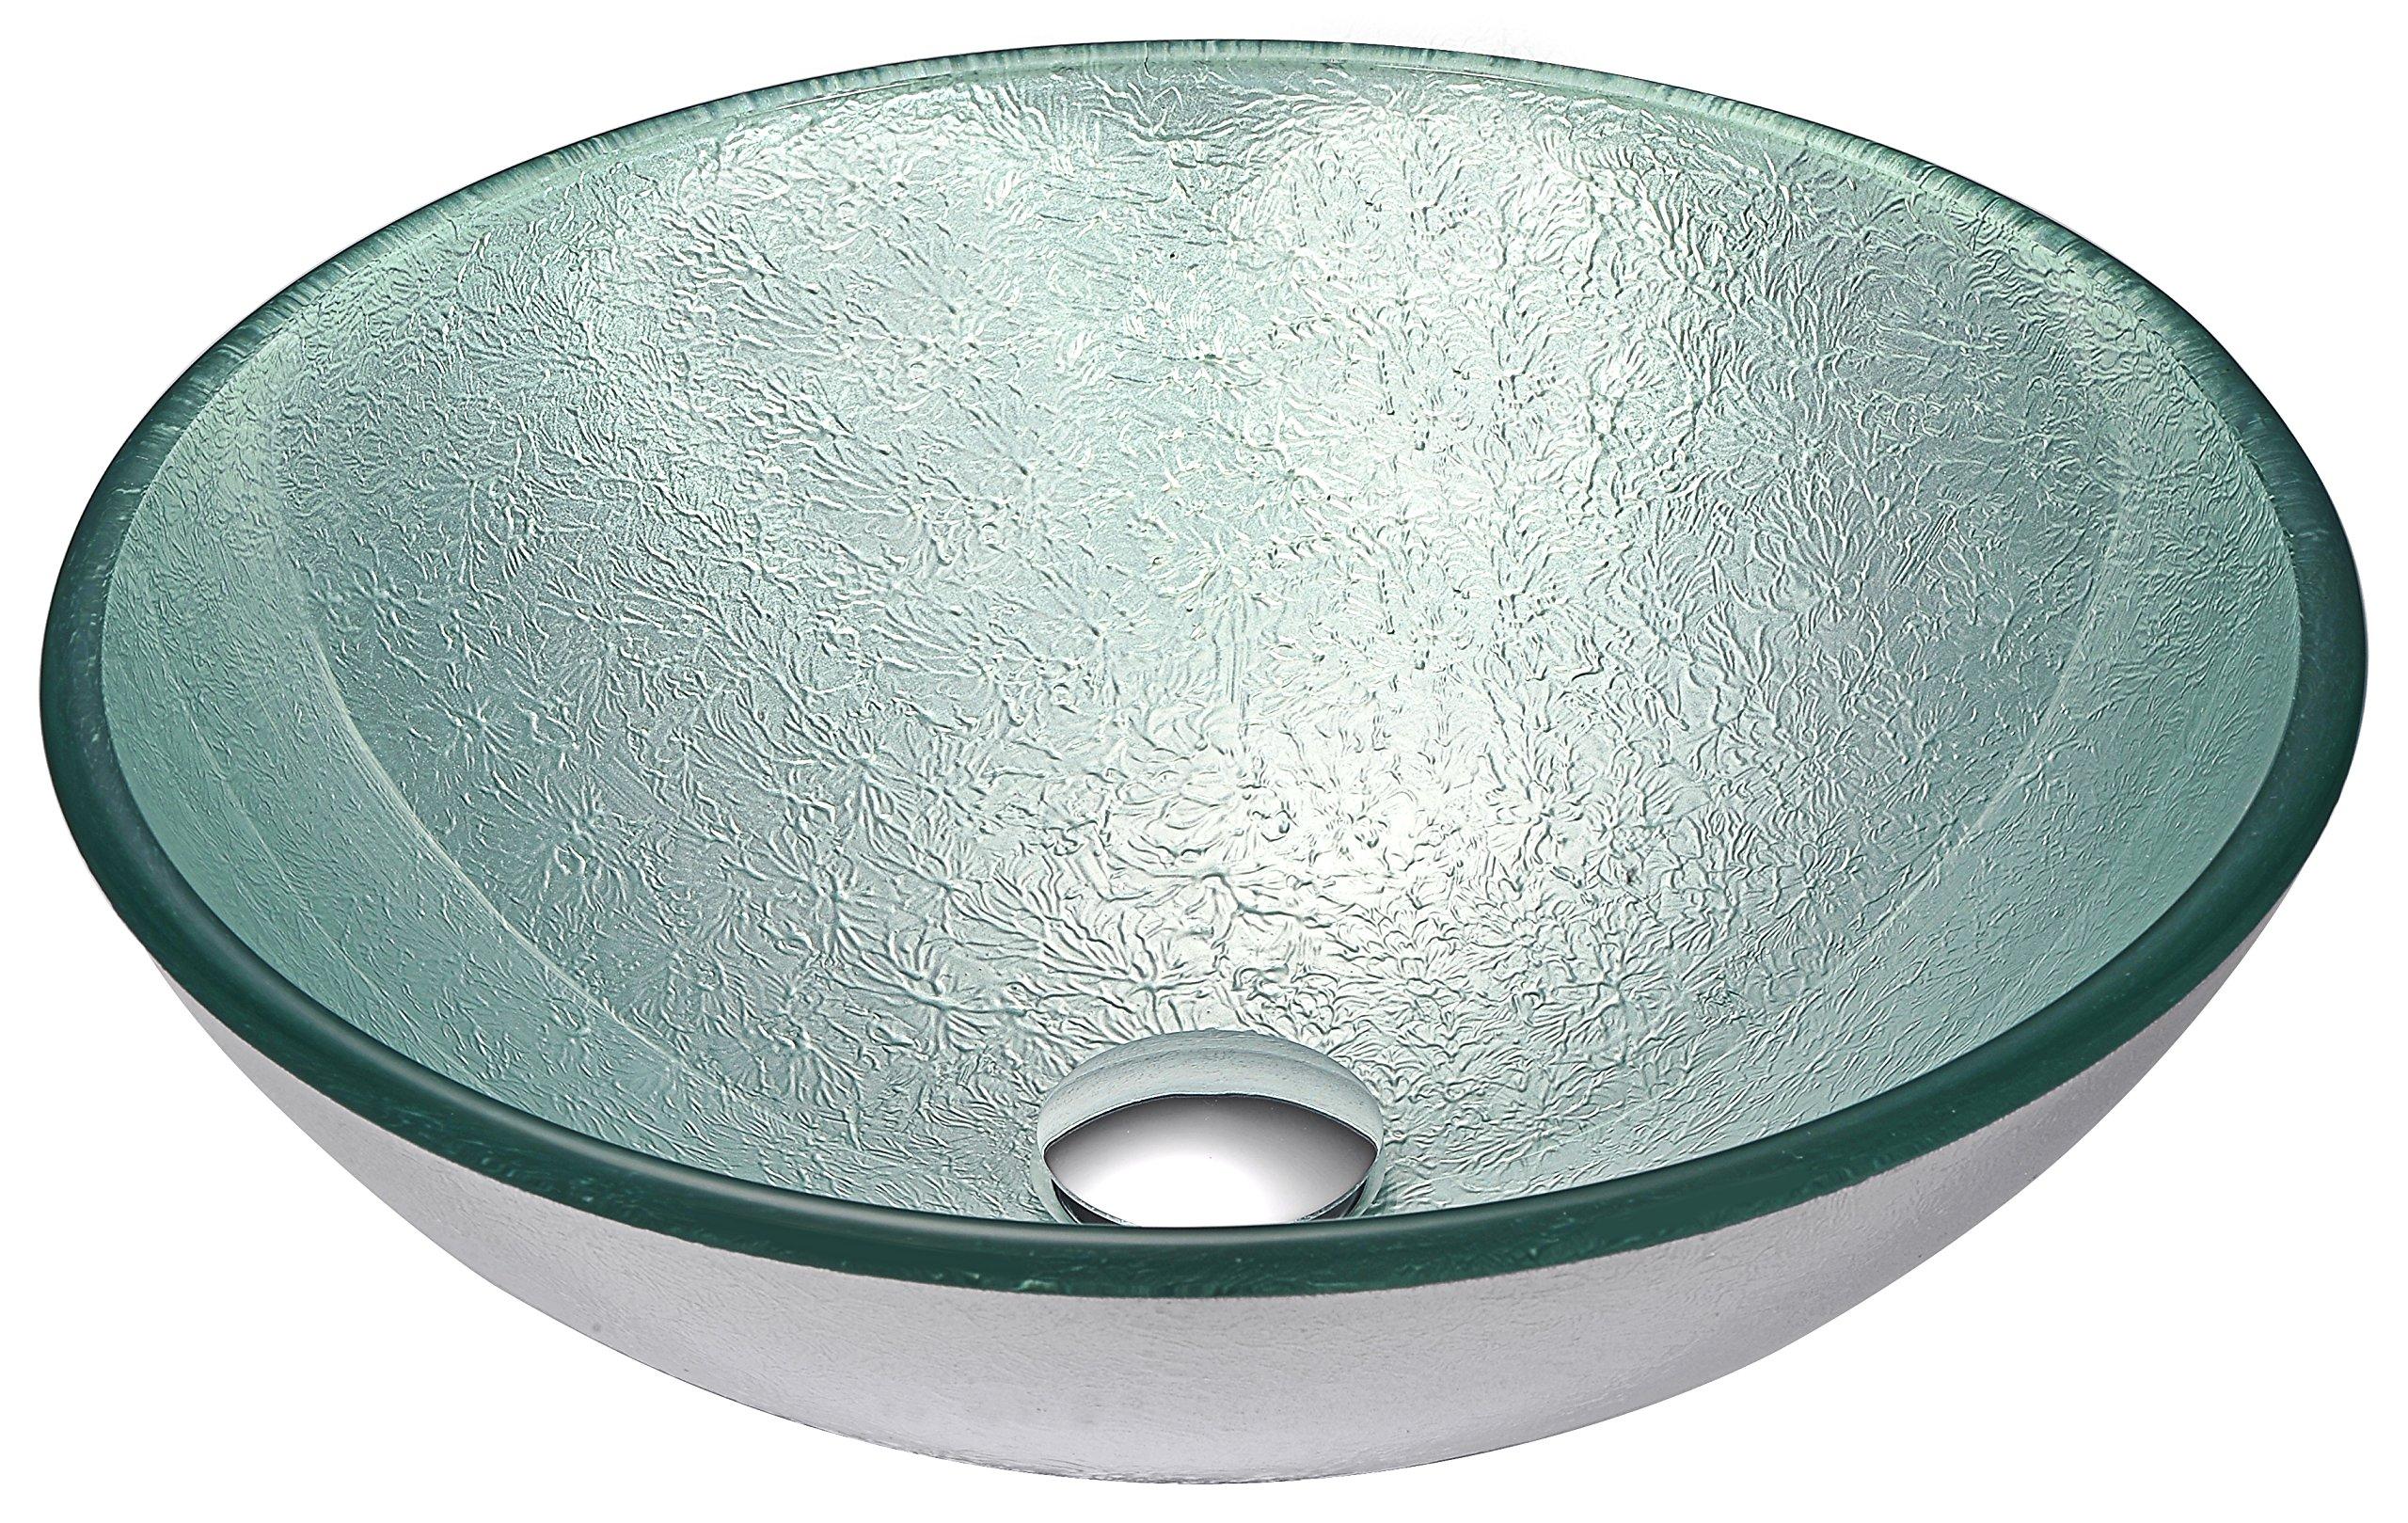 Tempered Glass Vessel Sink - Churning Silver - Spirito Series LS-AZ055 - ANZZI